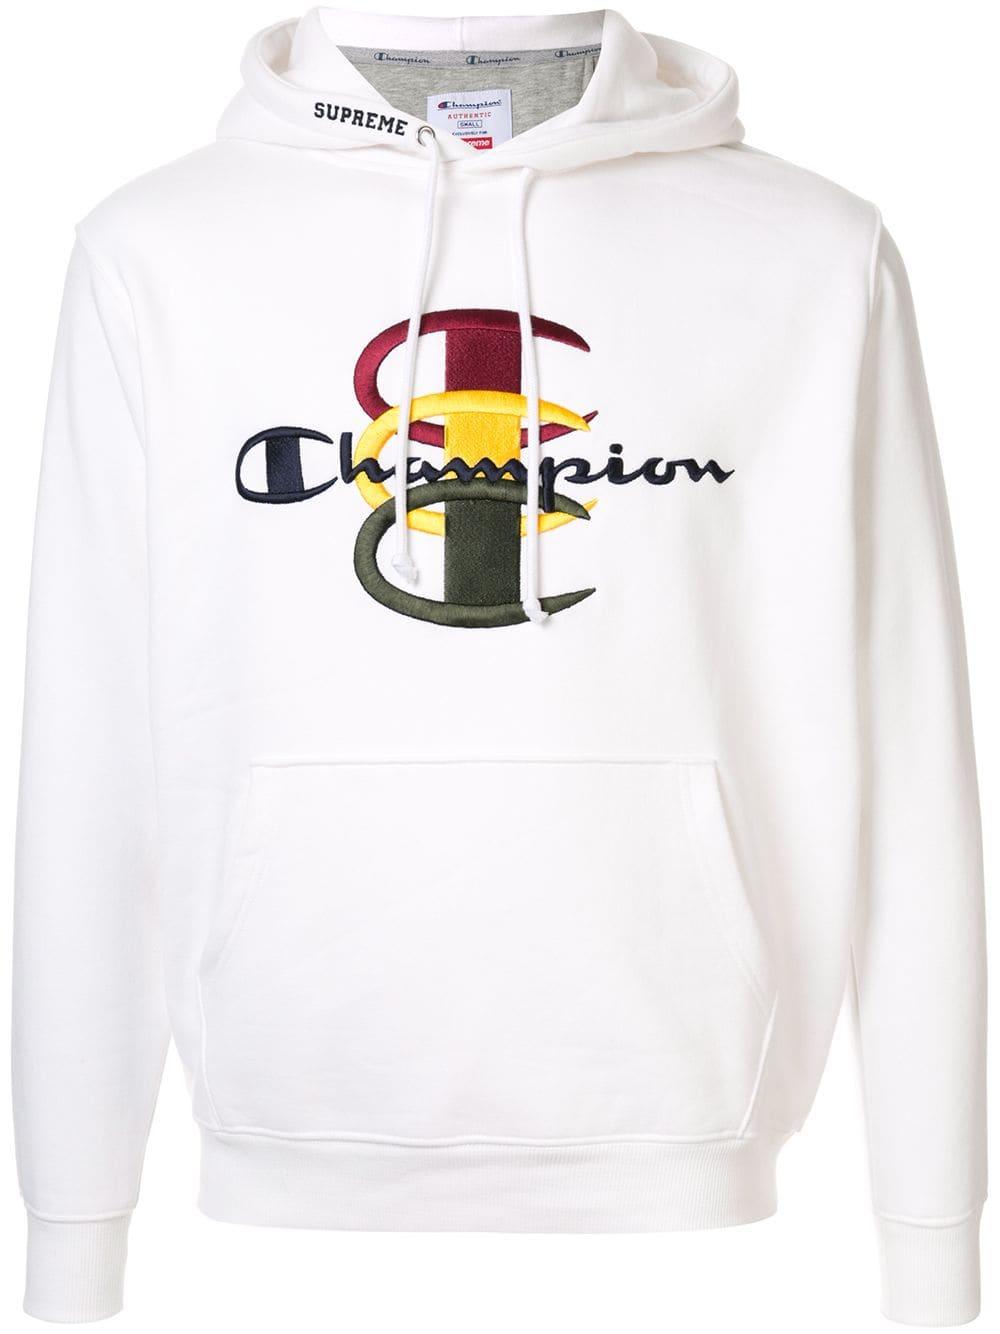 Supreme Champion Stacked Hooded Sweatshirt In White Modesens Hooded Sweatshirts Sweatshirts White Sweatshirt [ 1334 x 1000 Pixel ]